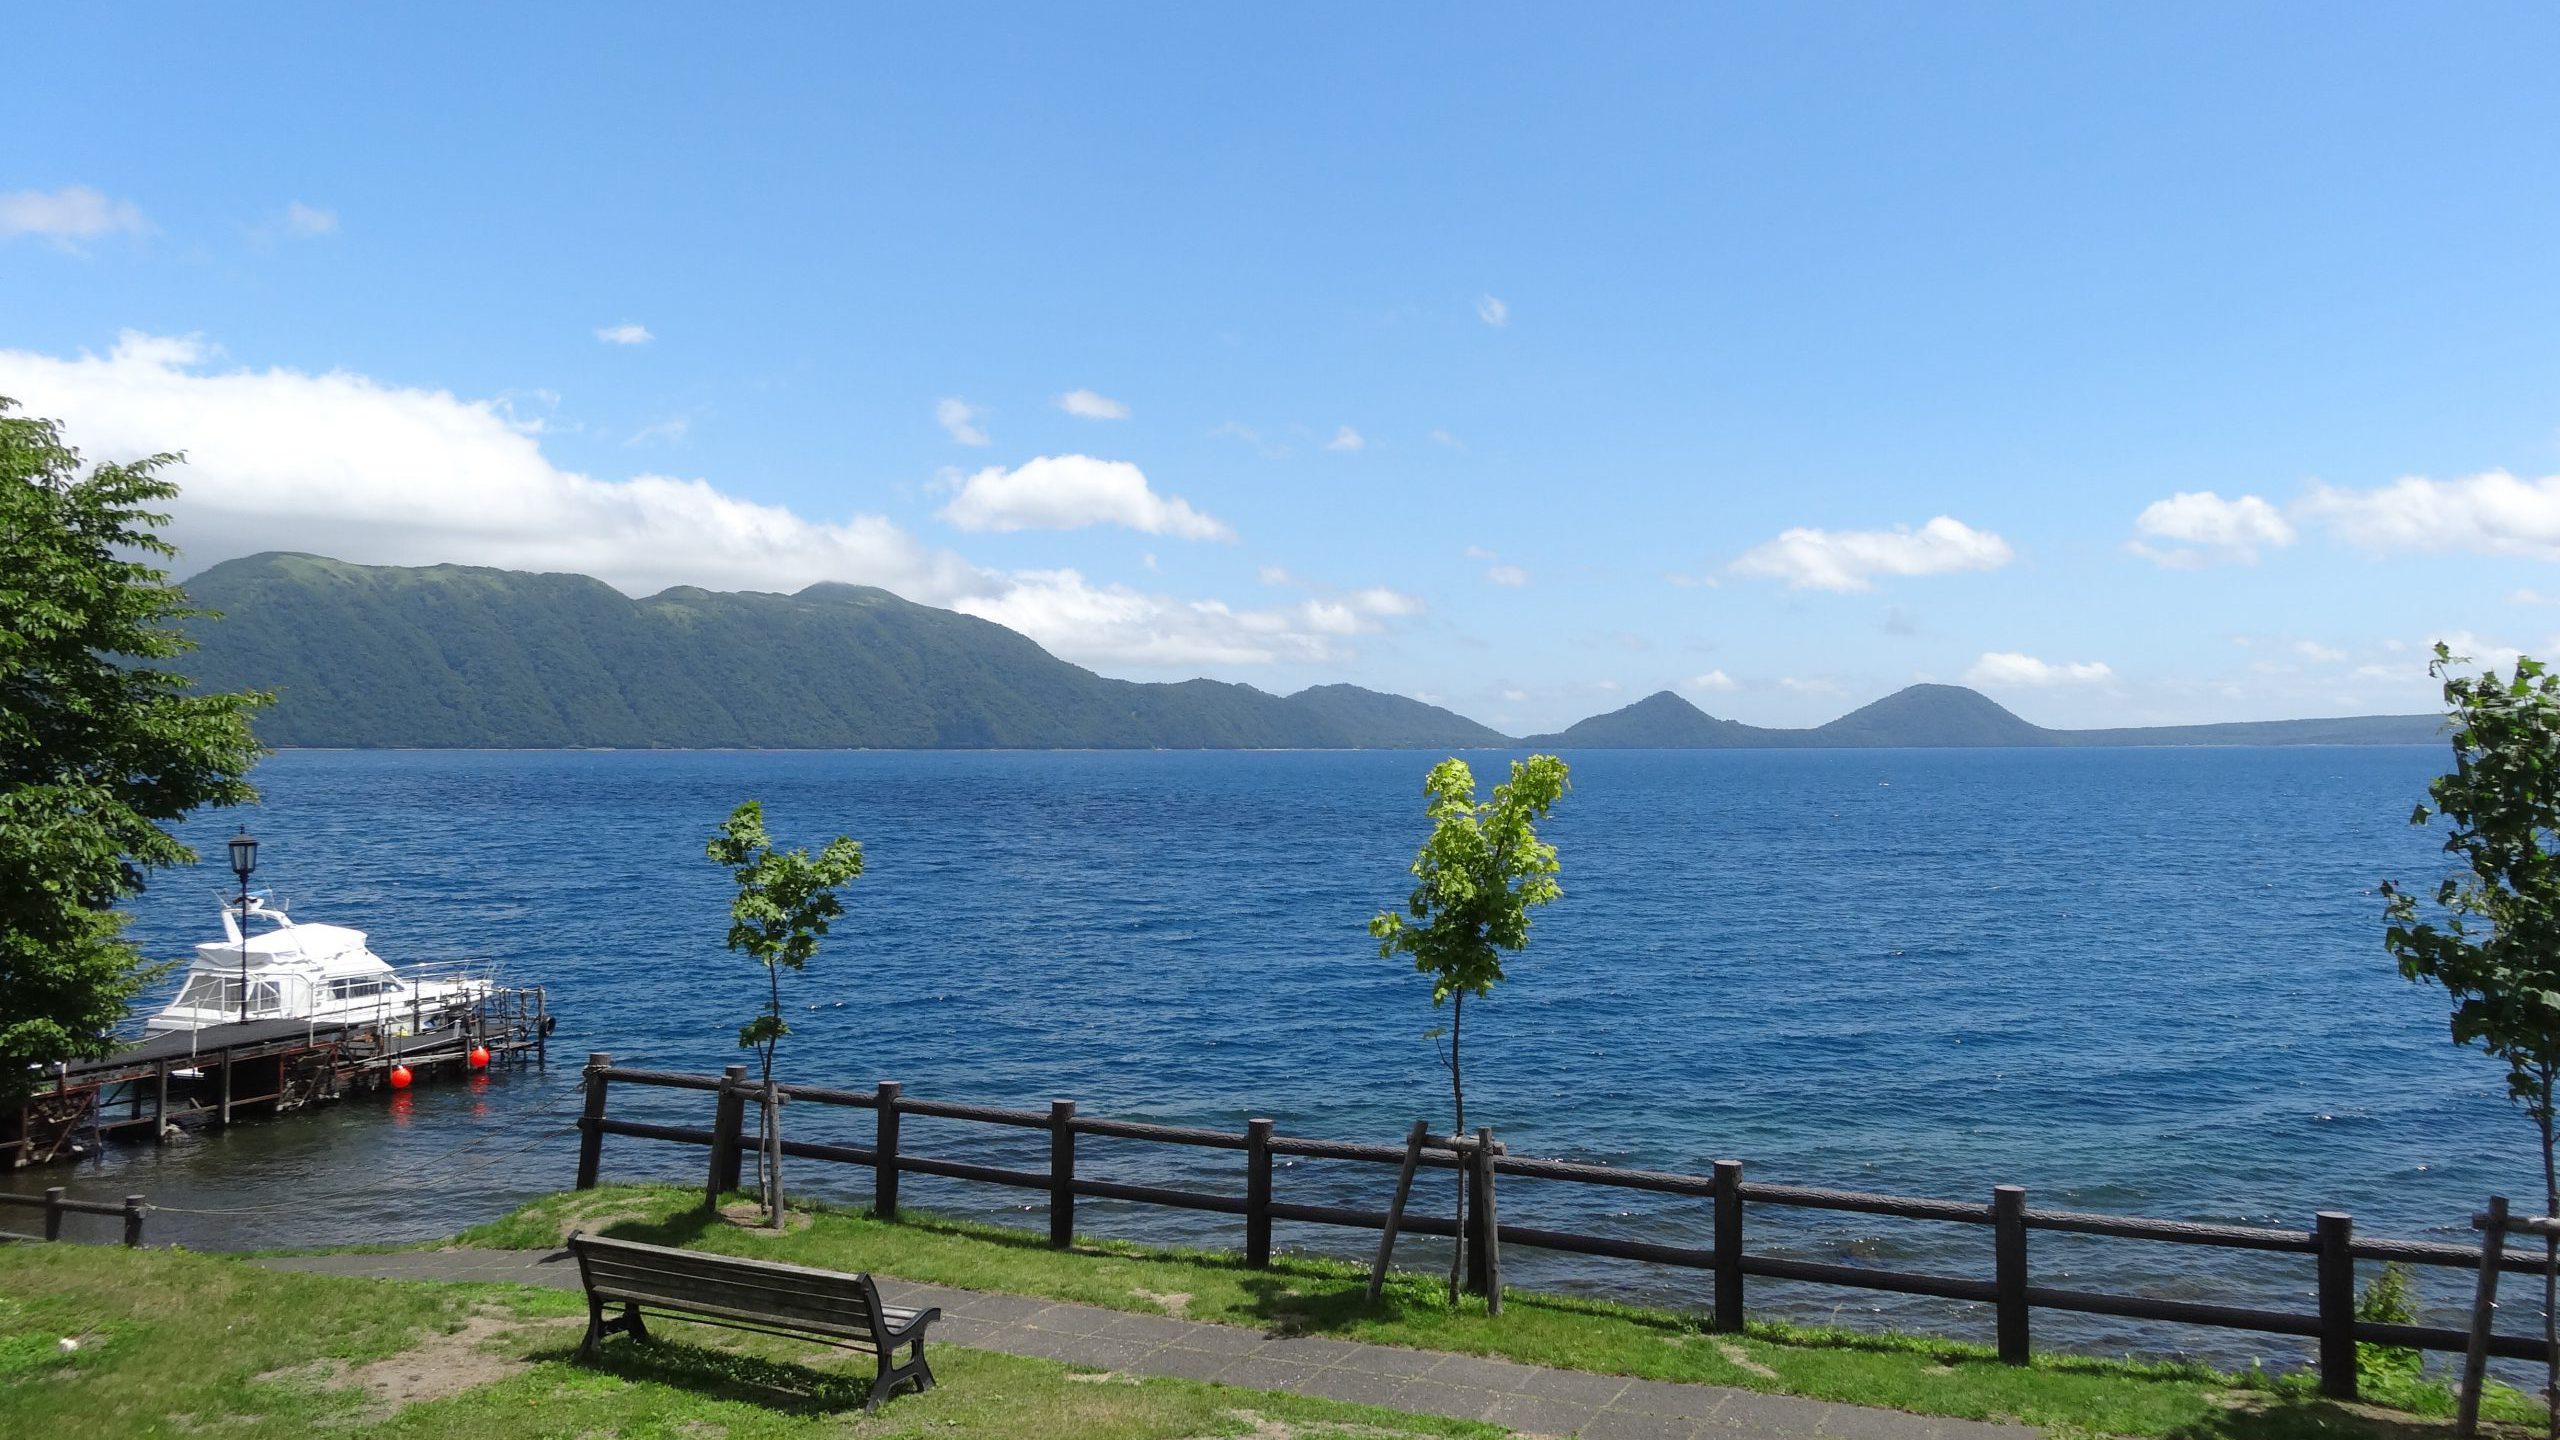 Marukoma Onsen on the Lake Shikotsu